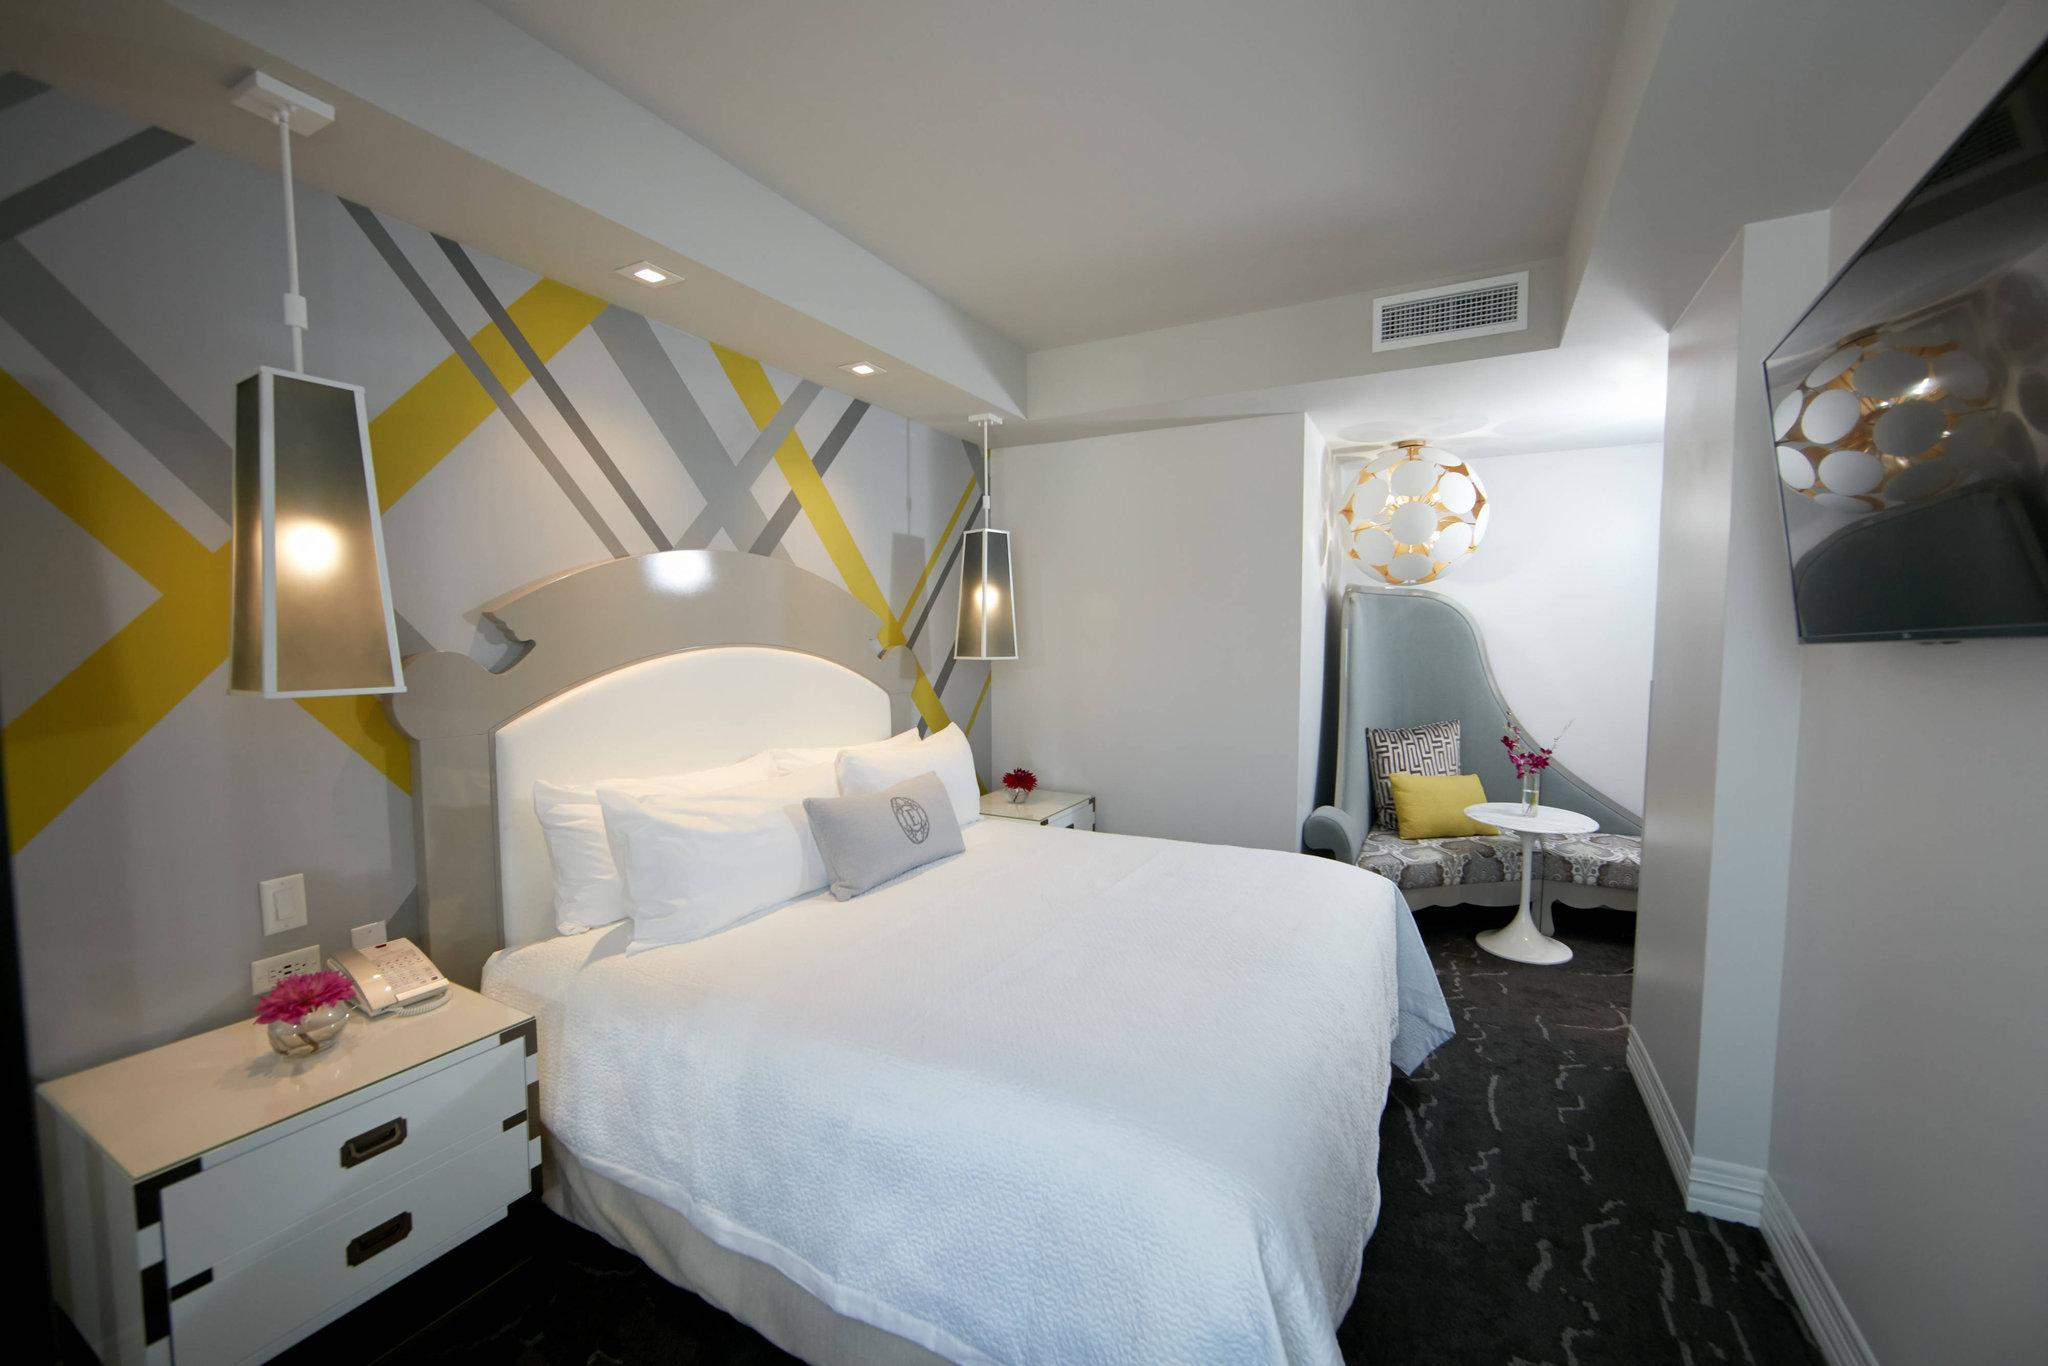 1 Bedroom Junior Suite, 1 King, Sofa bed, City view